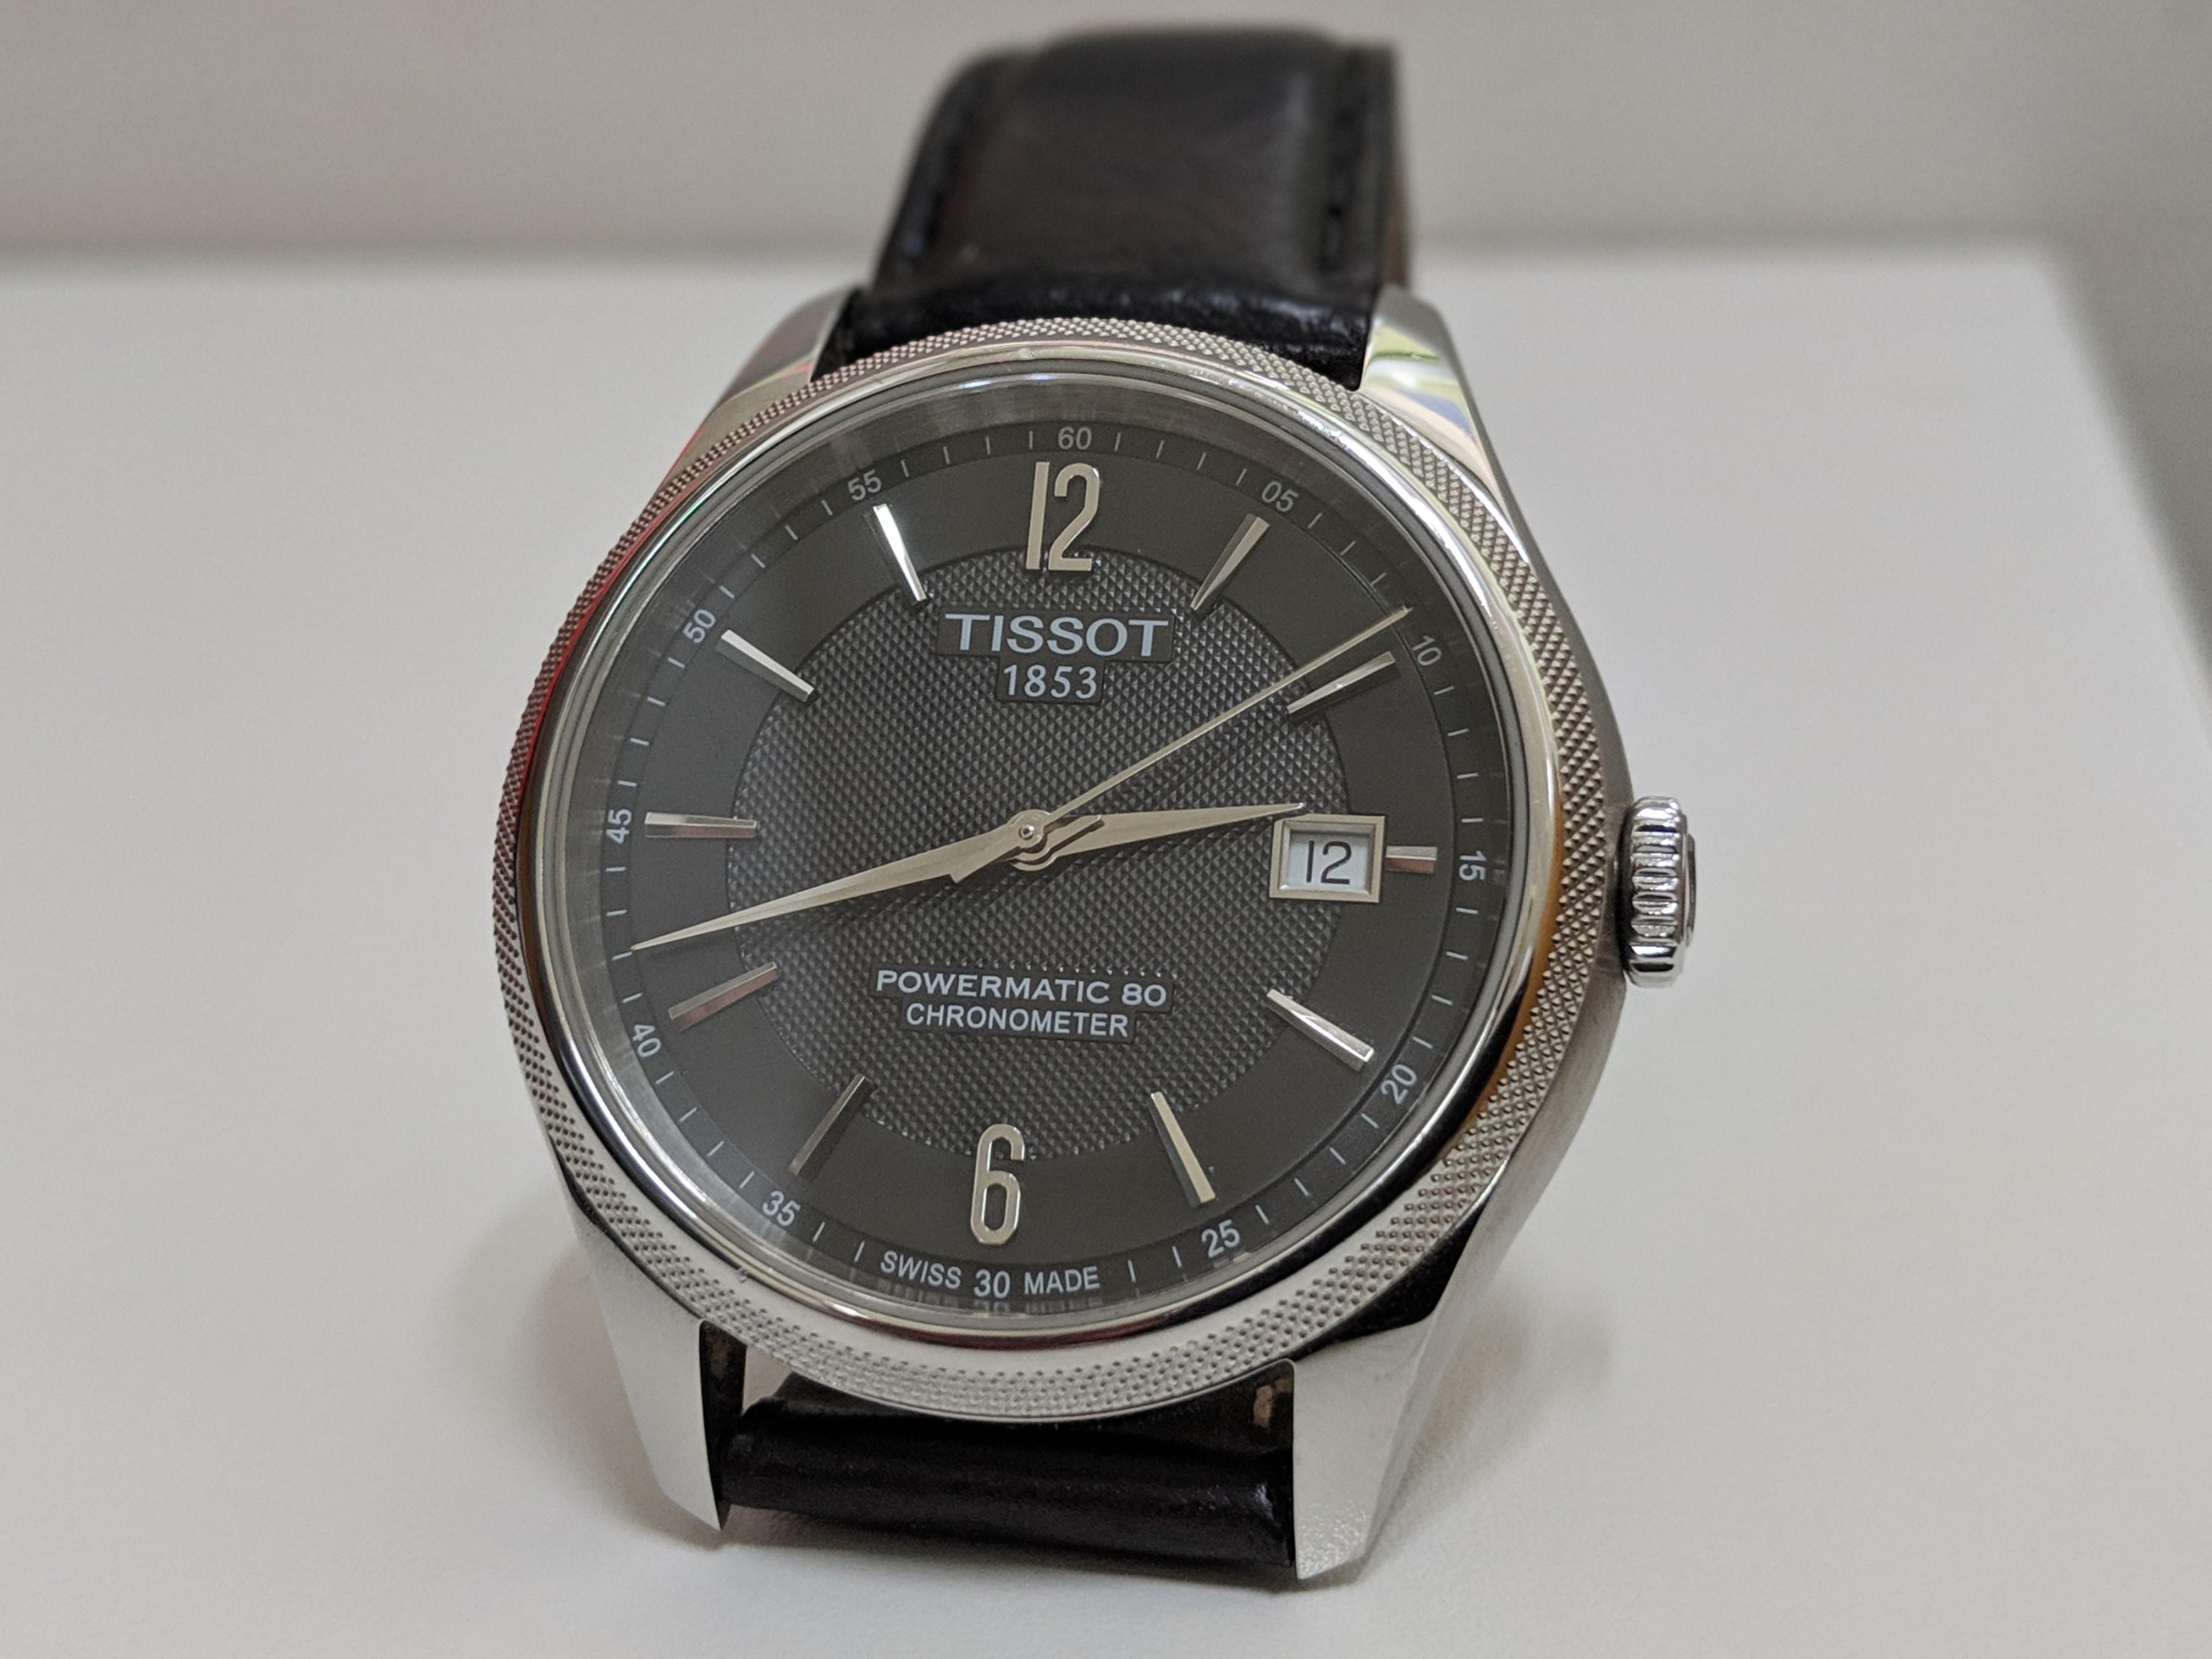 a23138d0140 Tissot Ballade Powermatic 80 Chronometer